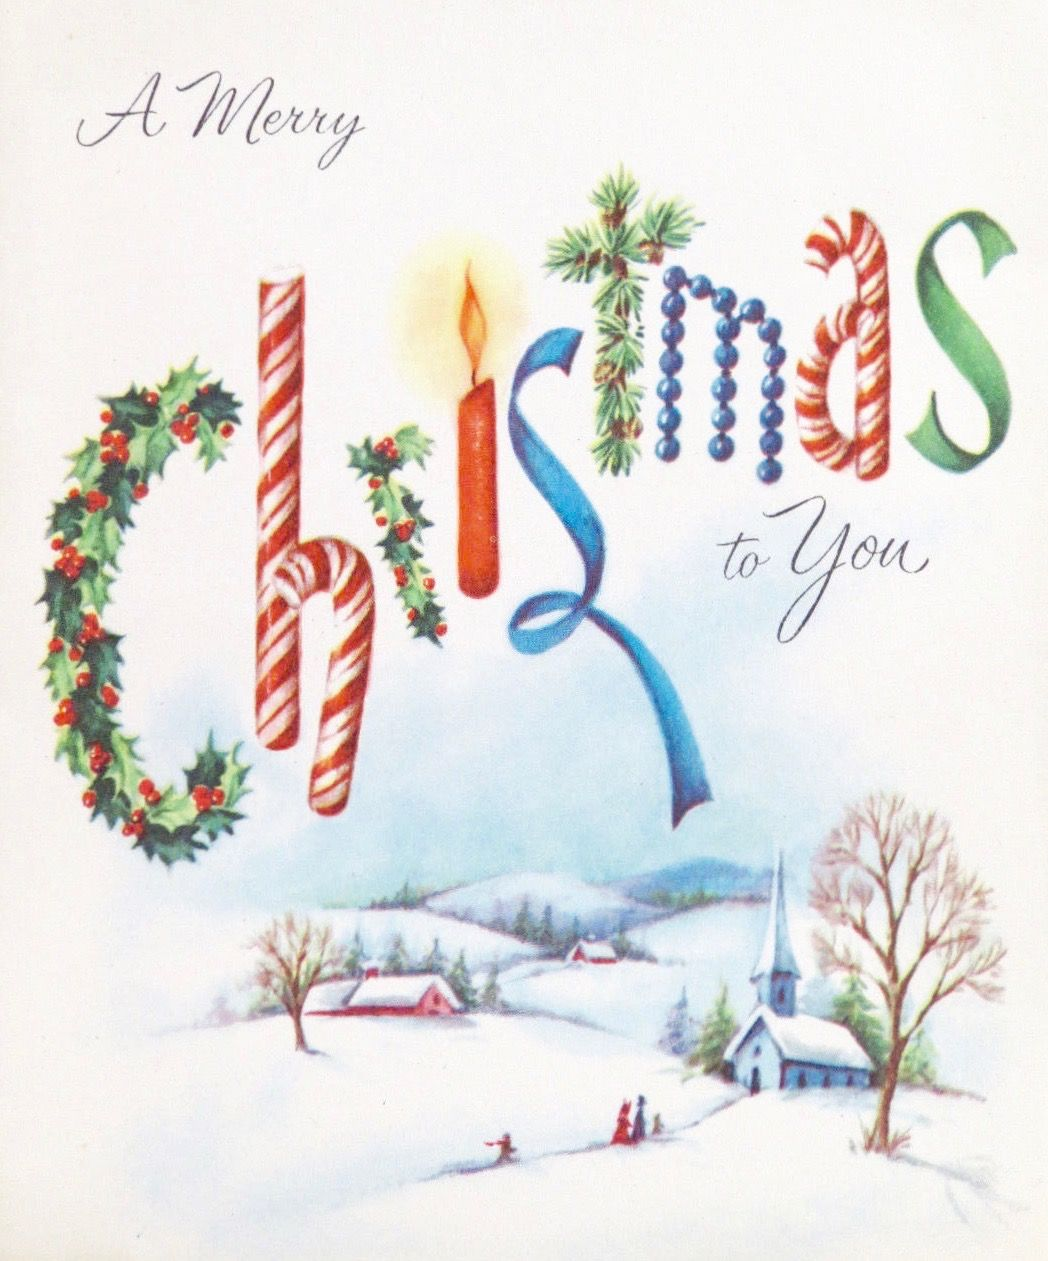 Vintage Candy Cane. Retro Christmas Card. A Merry Christmas to You.